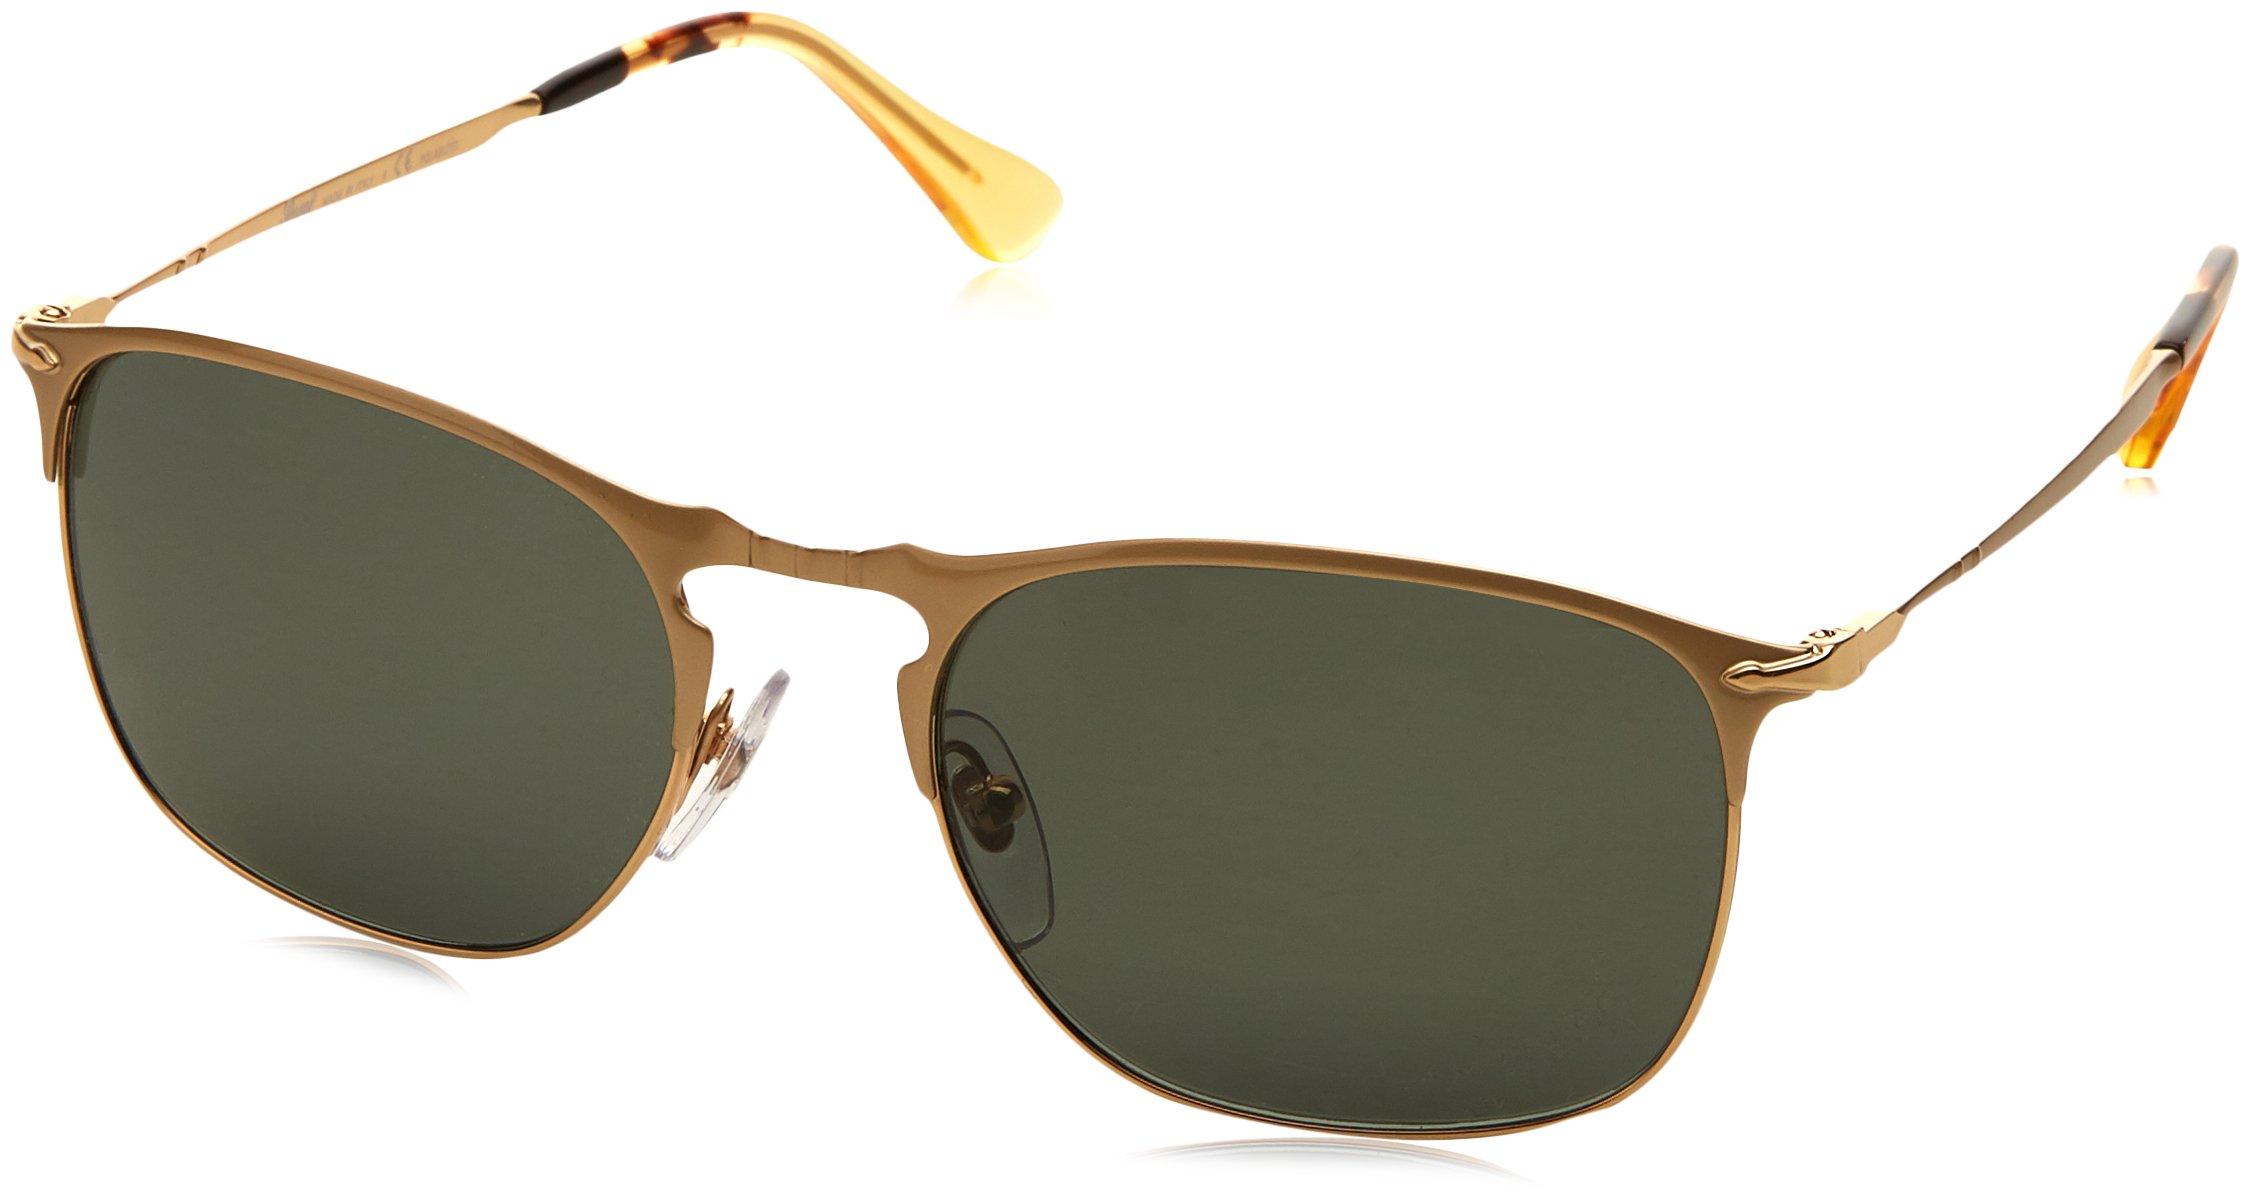 Persol Sonnenbrille (PO7359S)